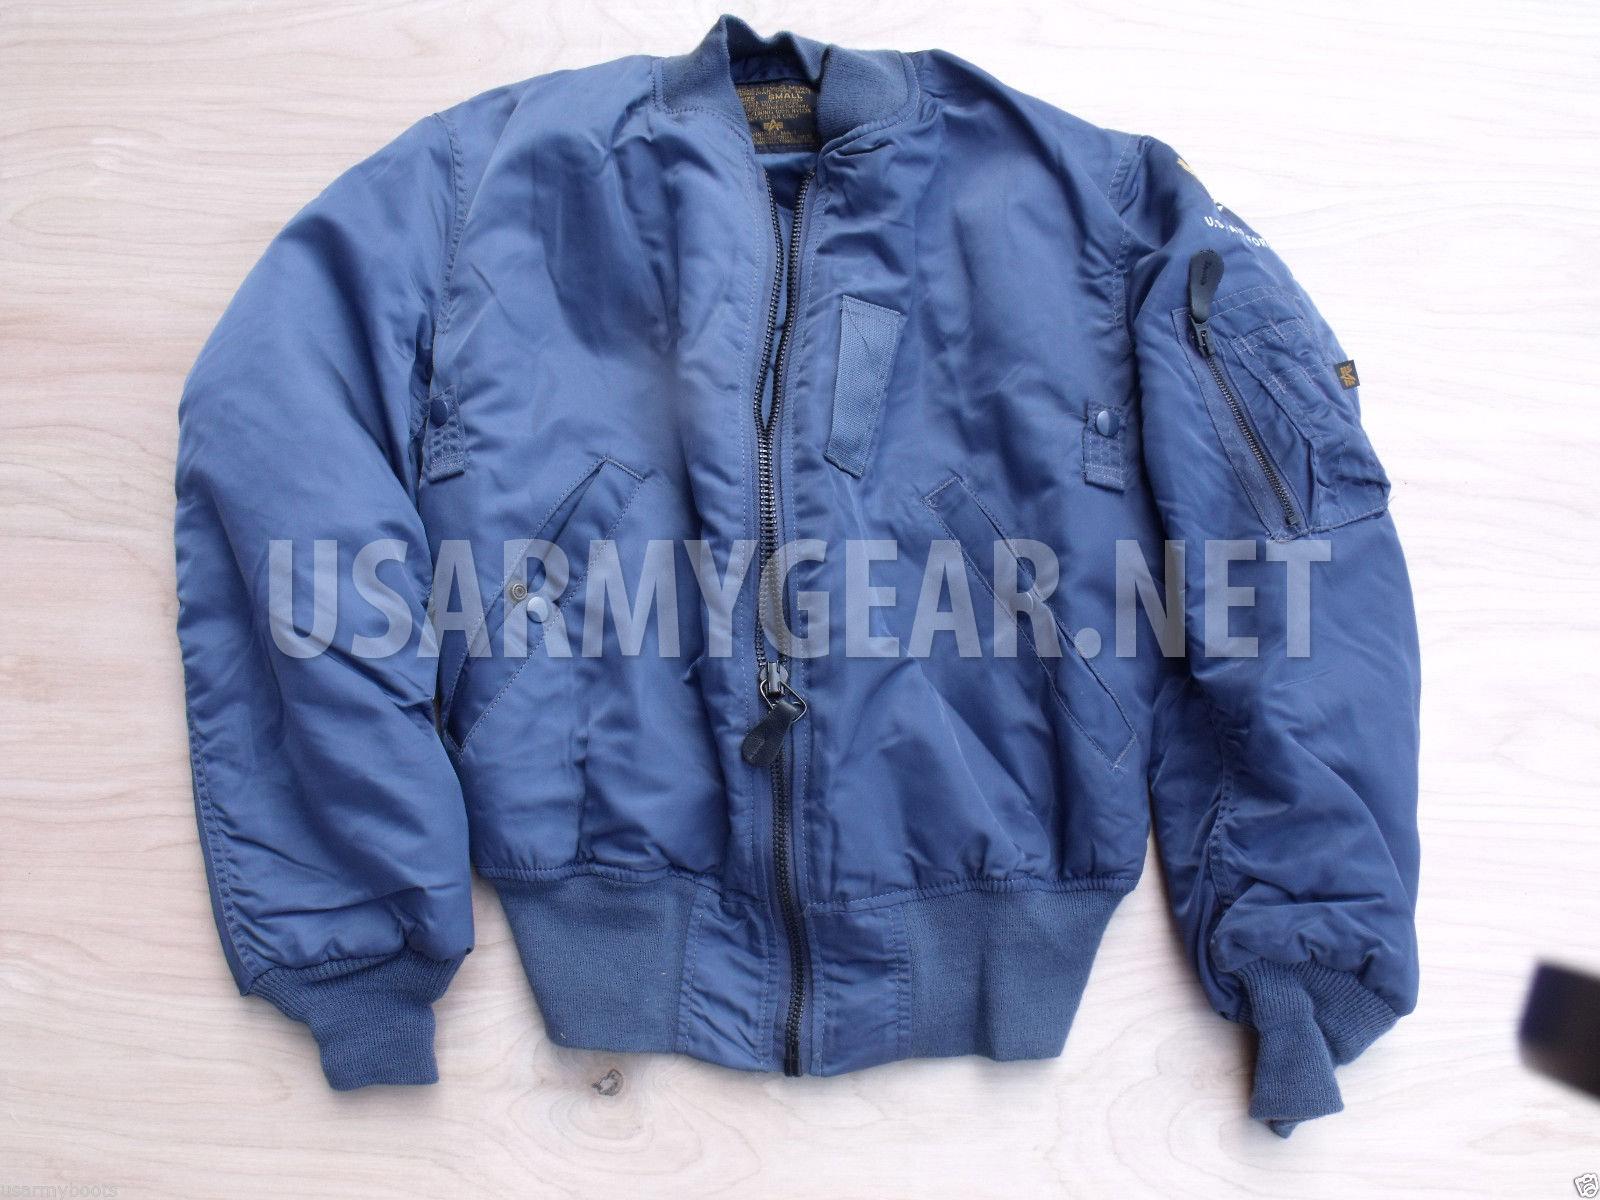 meet 369a7 8aa95 NEW Made in USA MA-1 Alpha Industries Pilot, Flight Jacket, US Air Force  Coat, Small